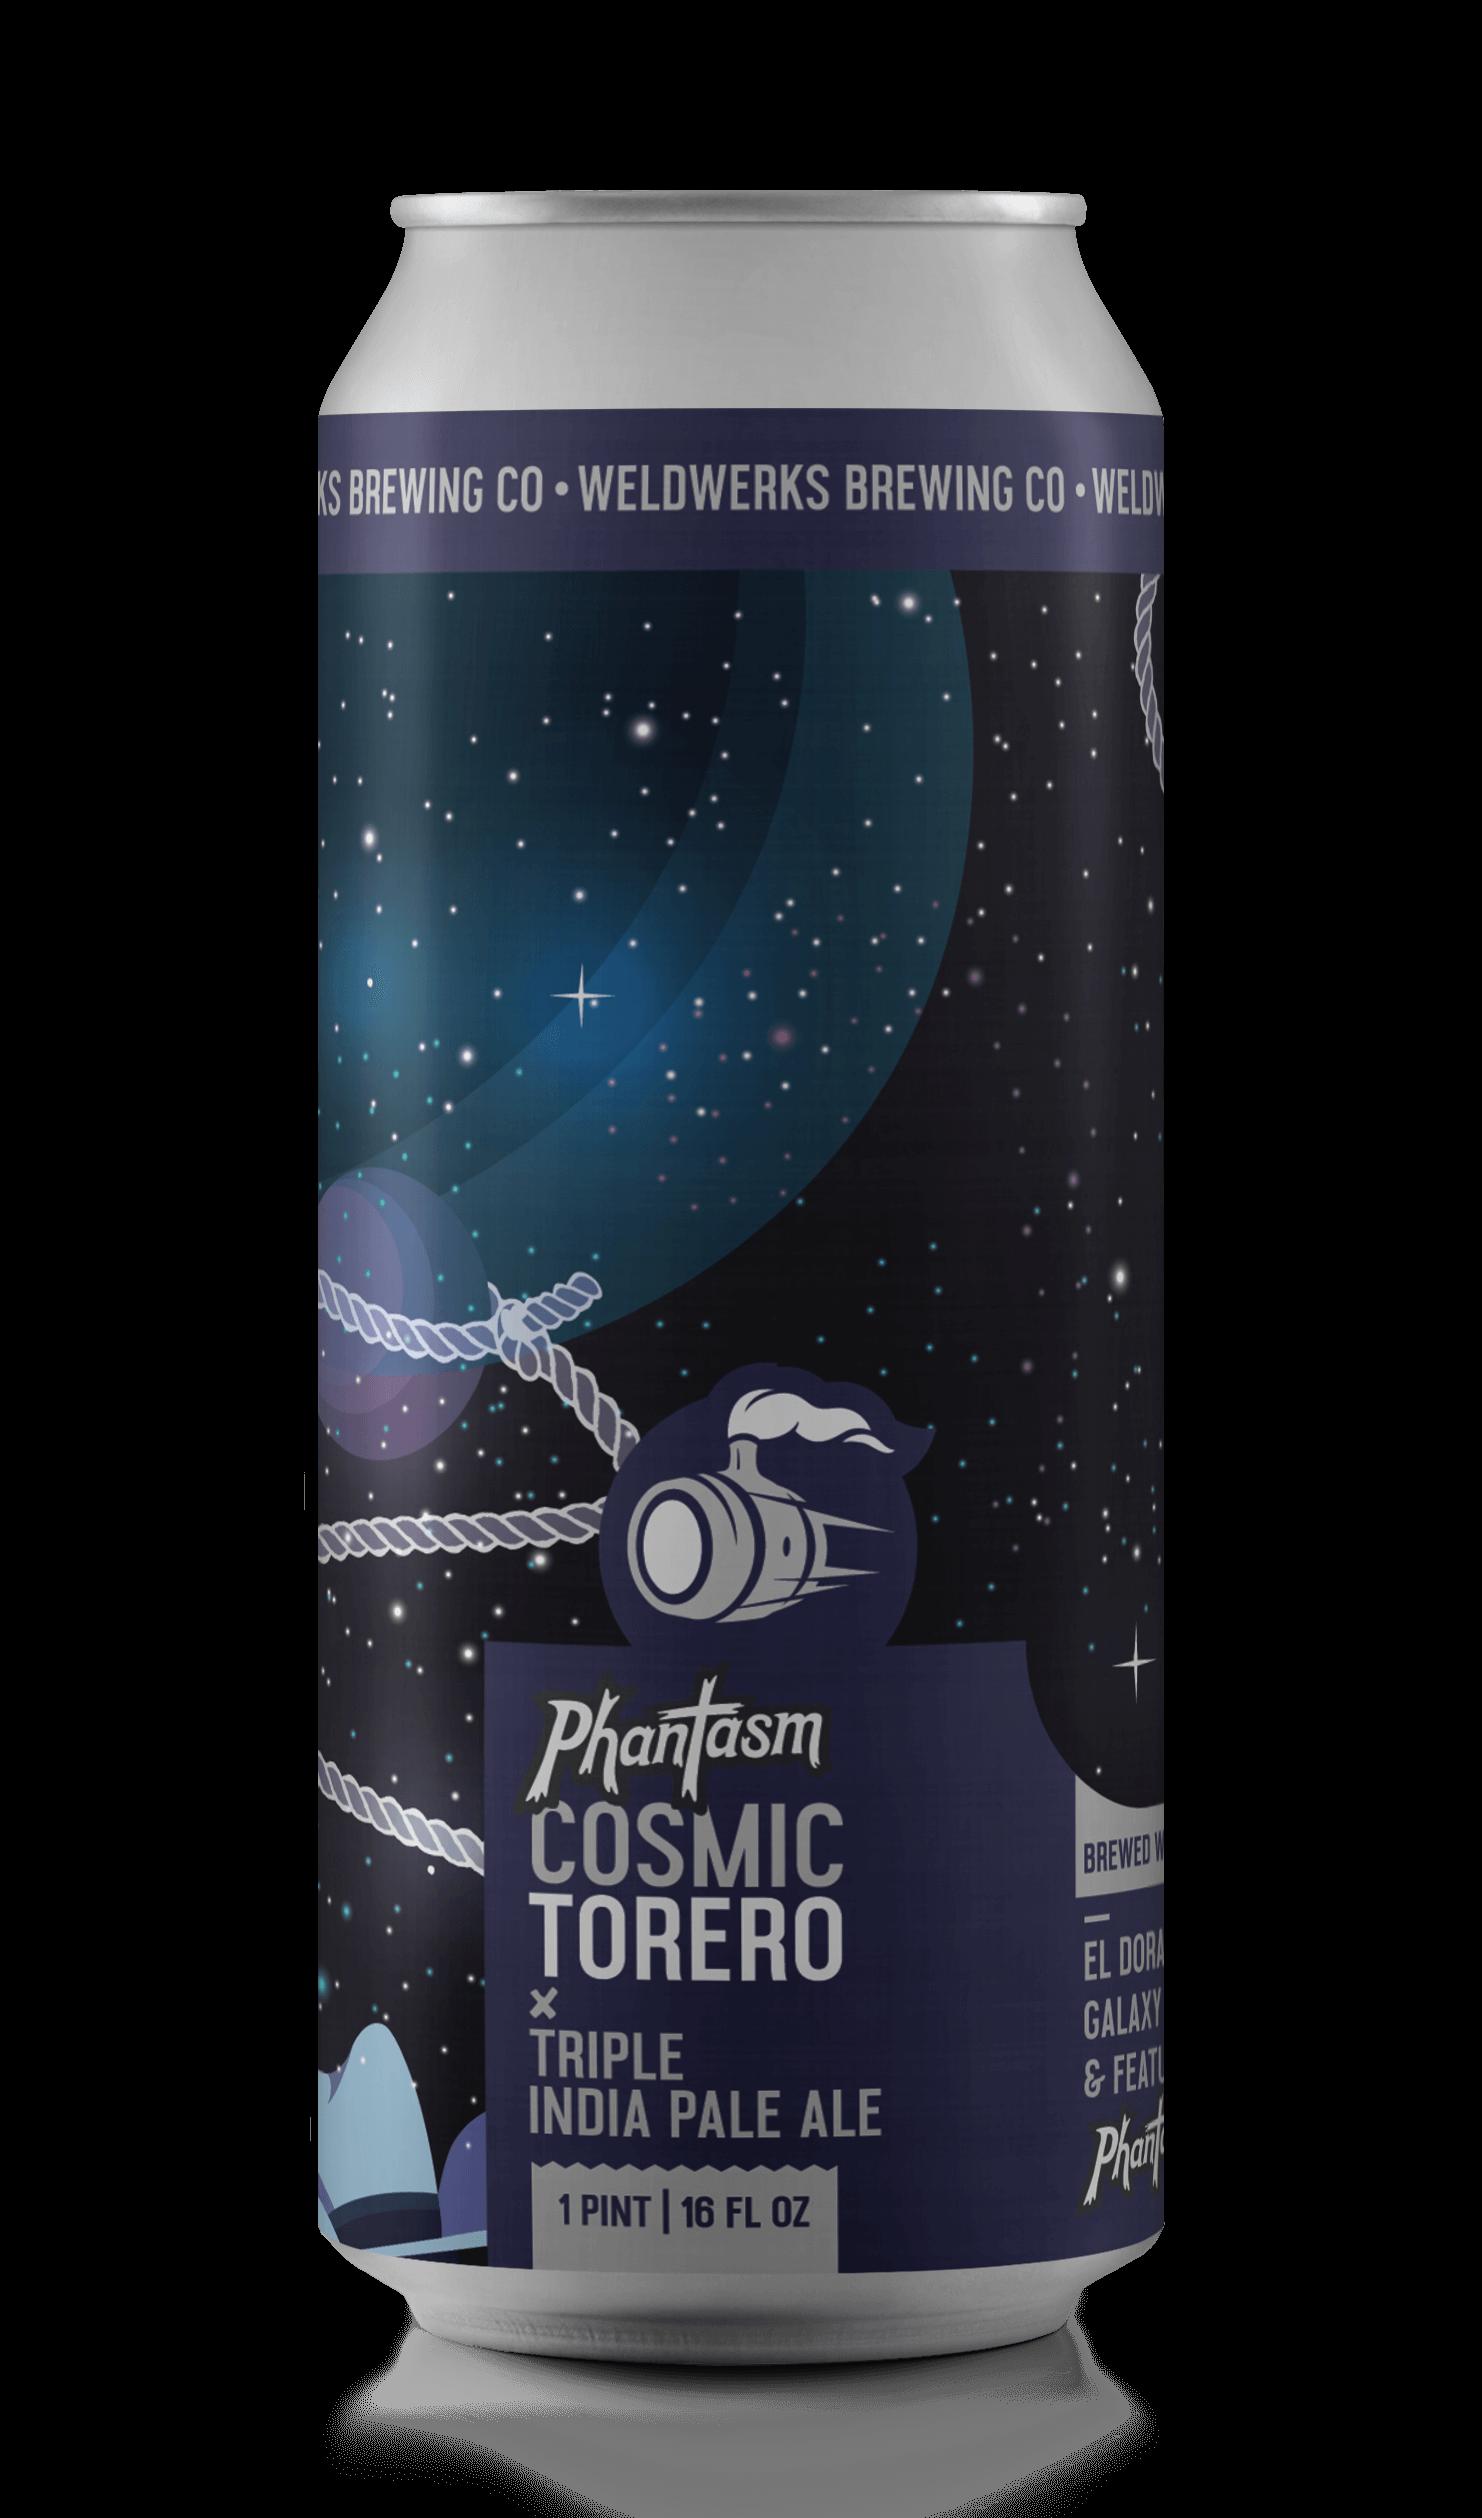 Phantasm Cosmic Torero